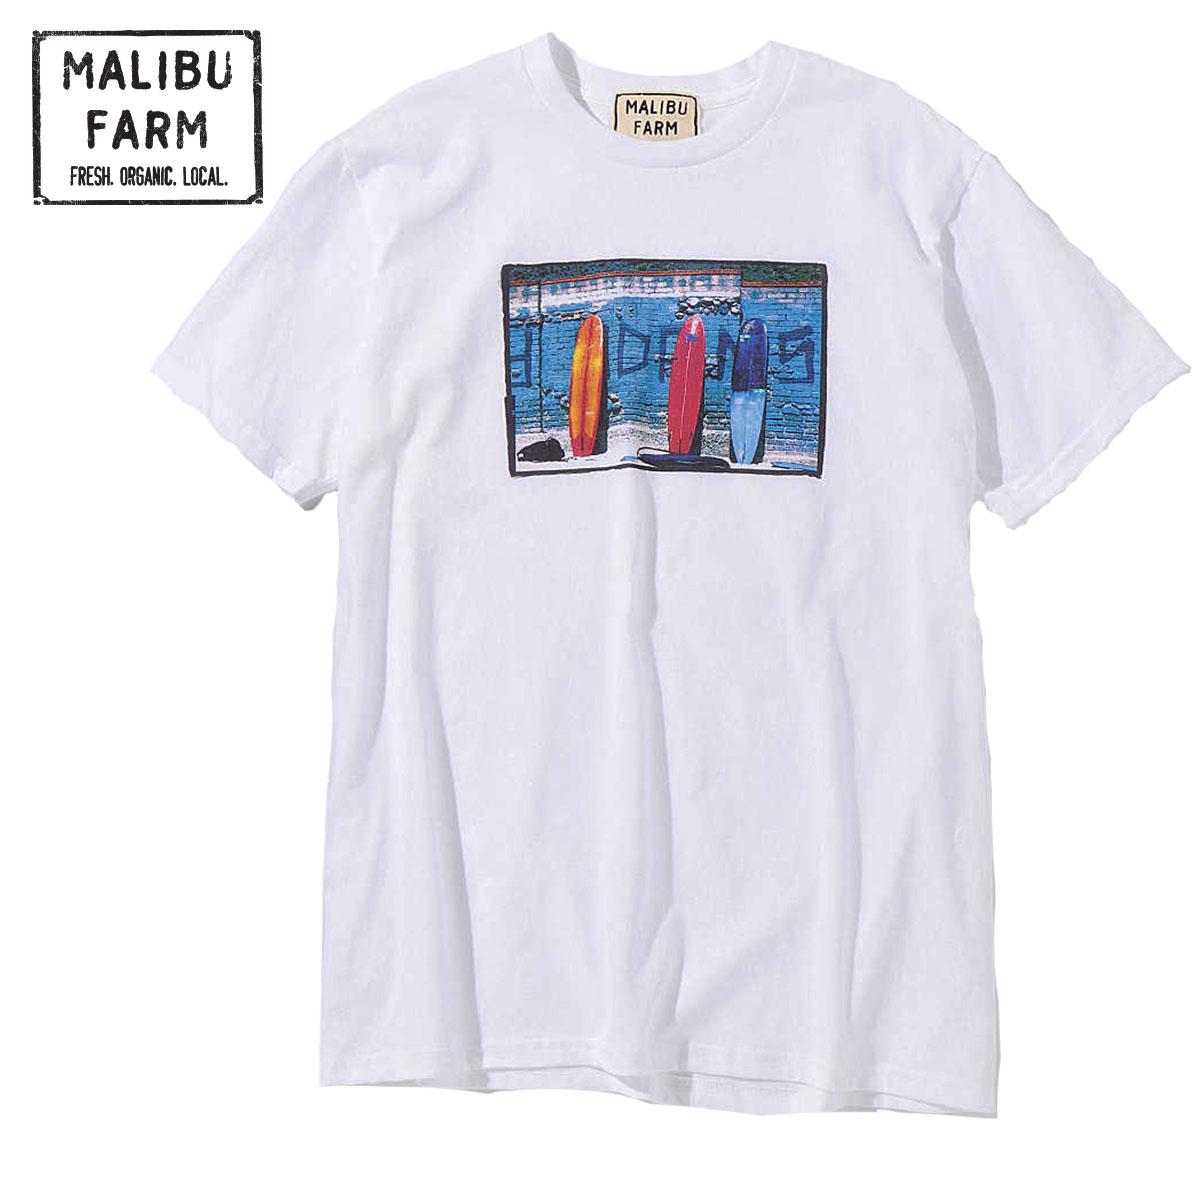 MALIBU FARM マリブファーム PHOTO BORD PRINT S/S TEE